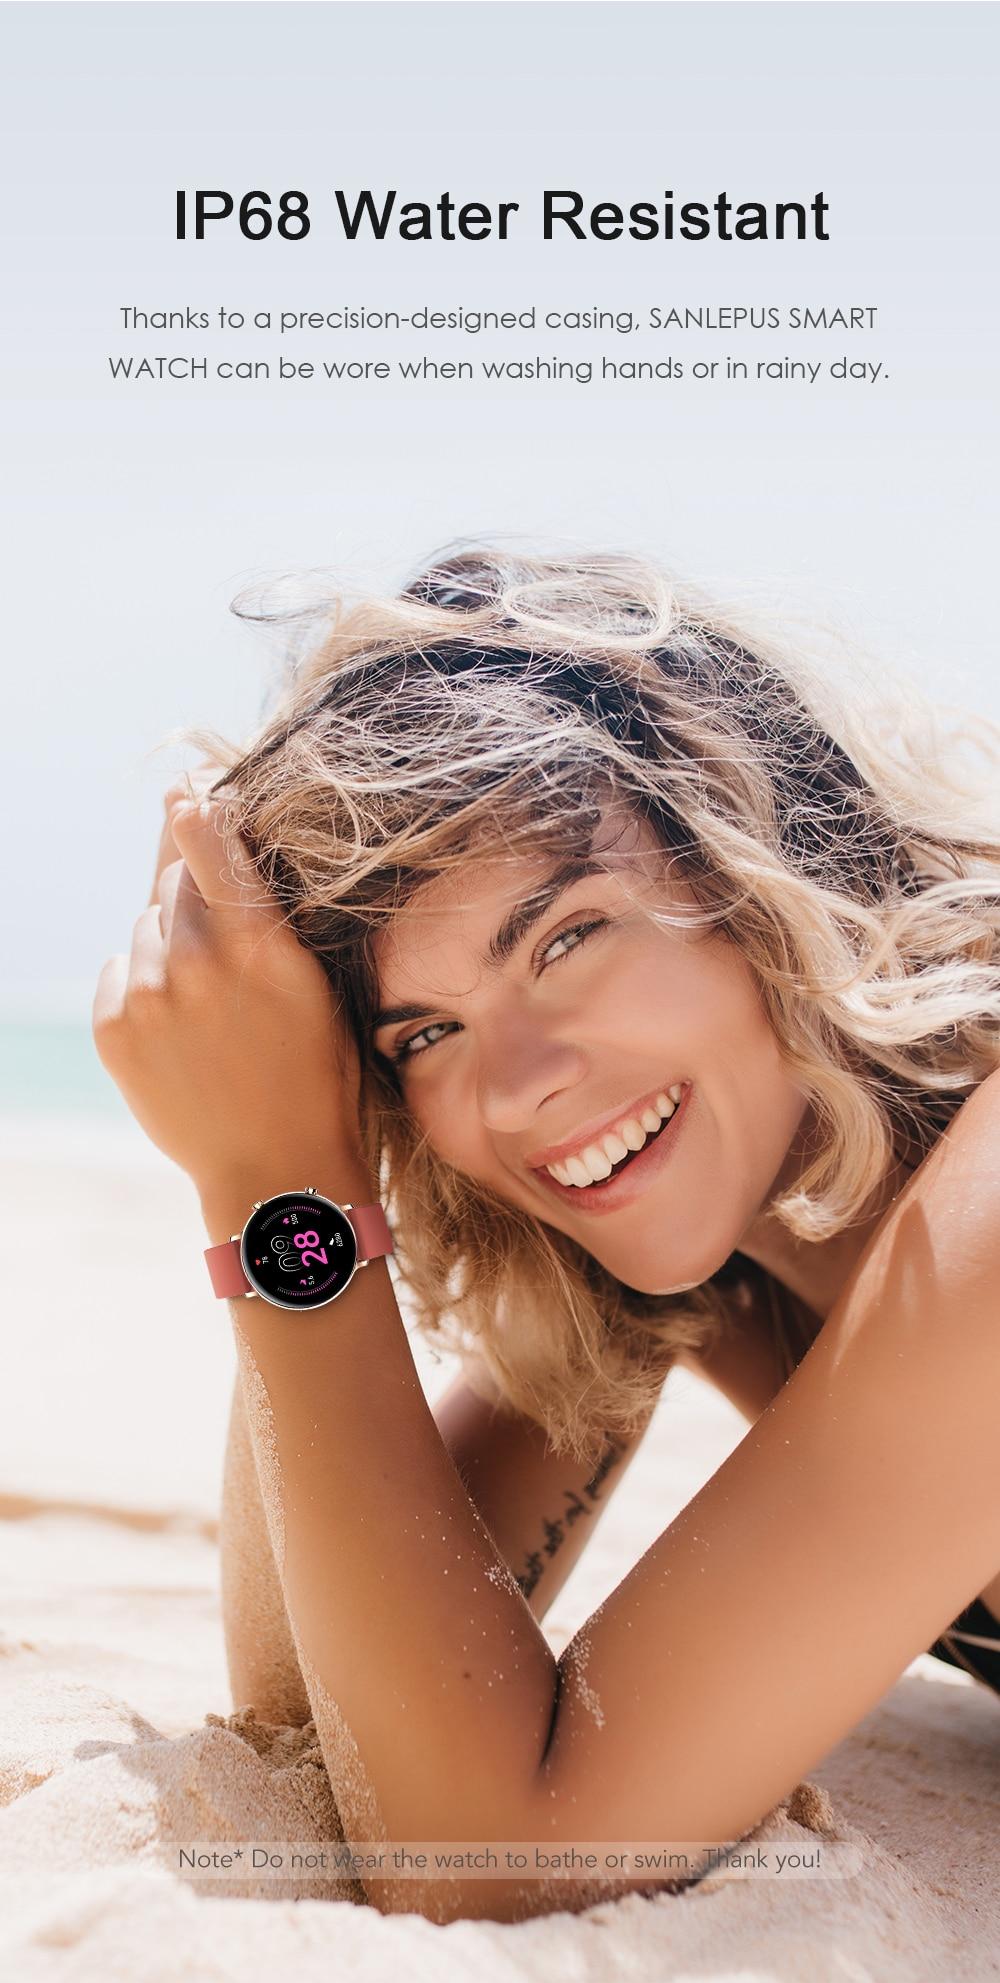 H2d7e804e13244b478de82f98ce38ddffb SANLEPUS 2021 Smart Watch Dial Calls Men Women Waterproof Smartwatch ECG PPG Fitness Bracelet Band For Android Apple Xiaomi